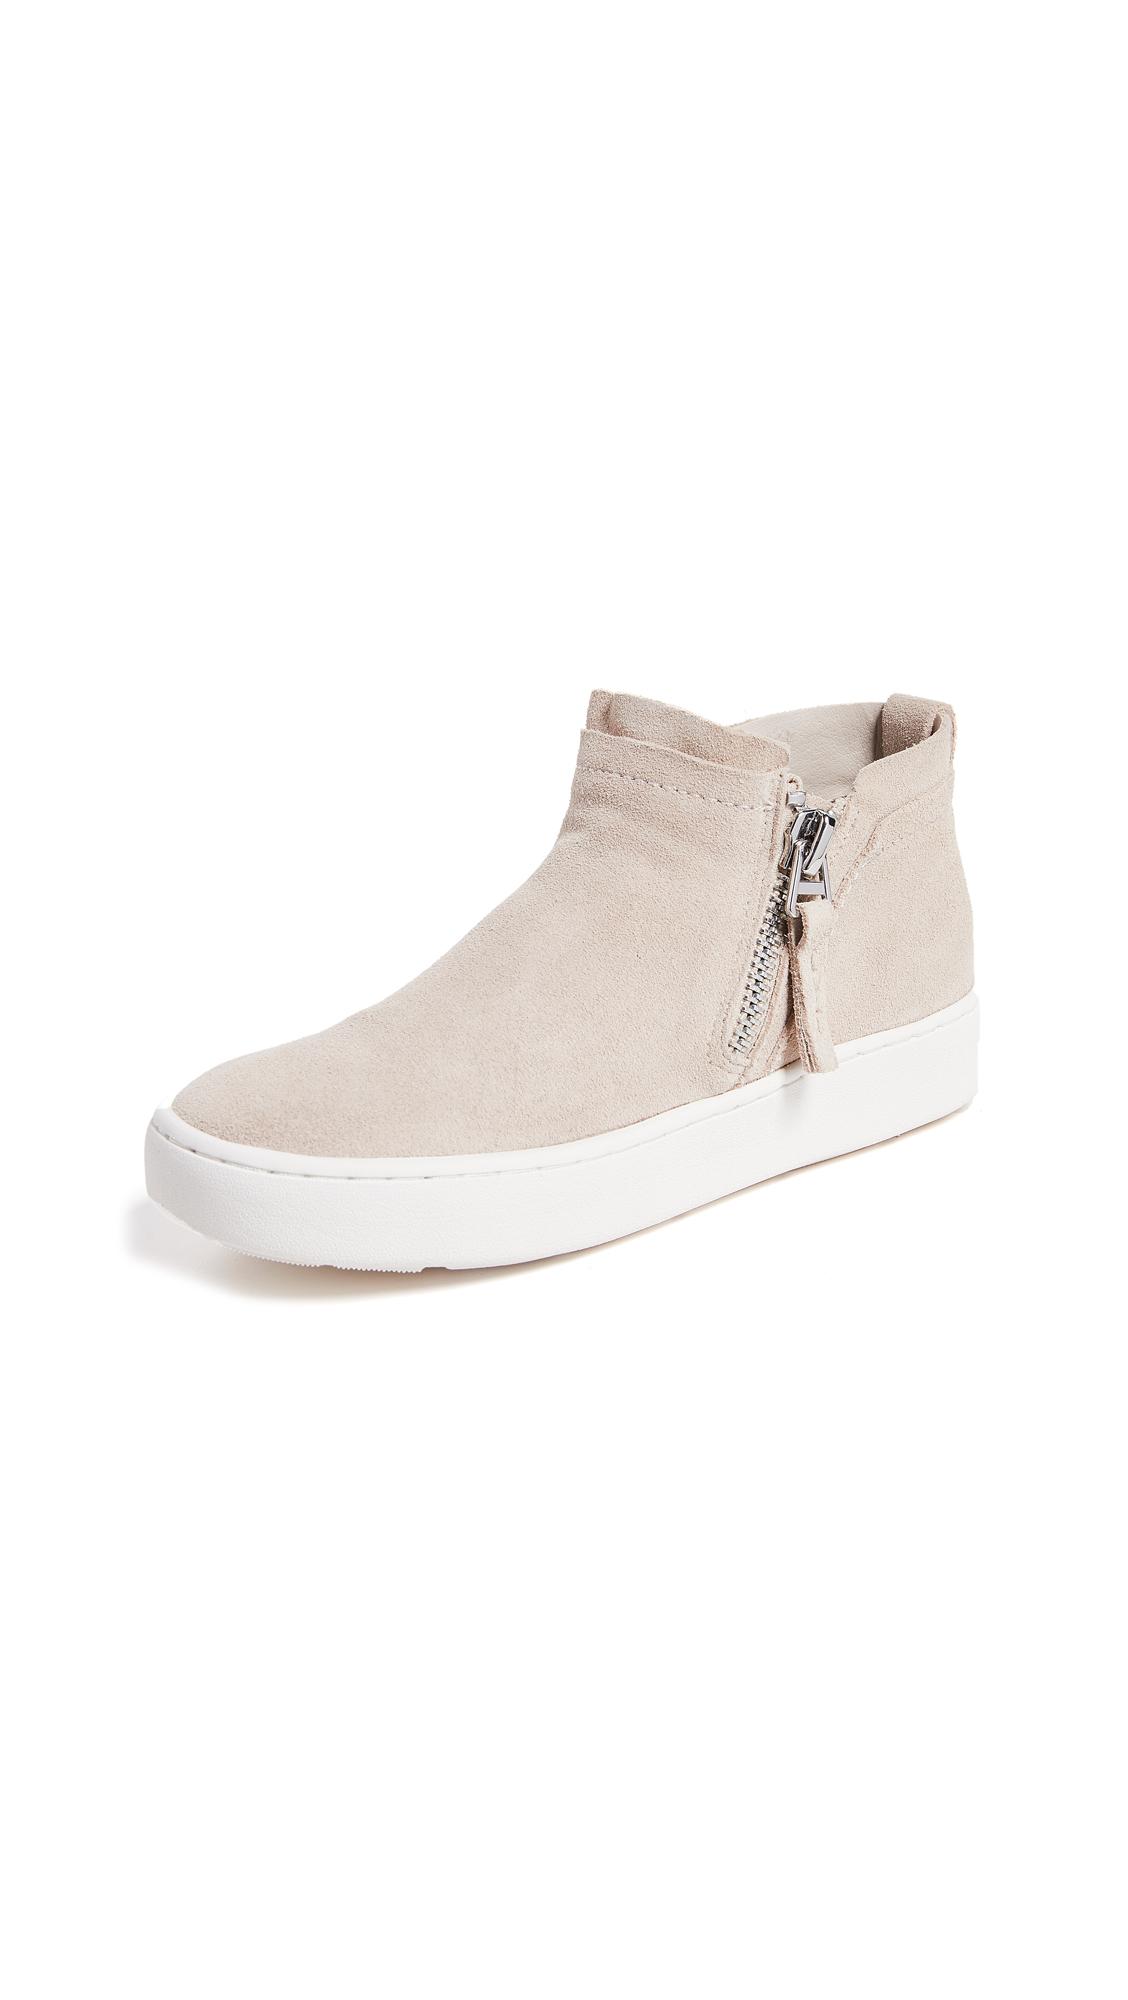 Dolce Vita Tobee Sneakers - Sand